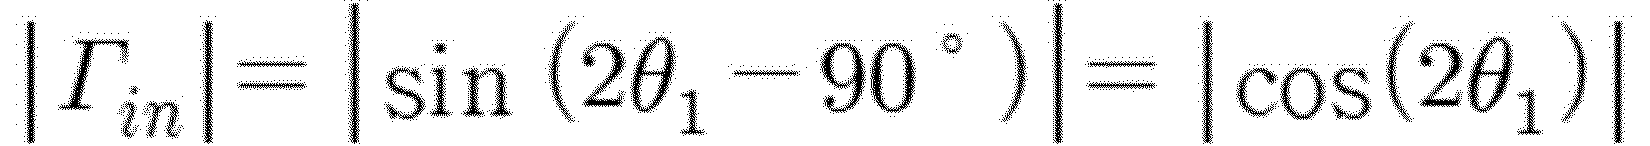 Figure PCTKR2016012769-appb-I000006